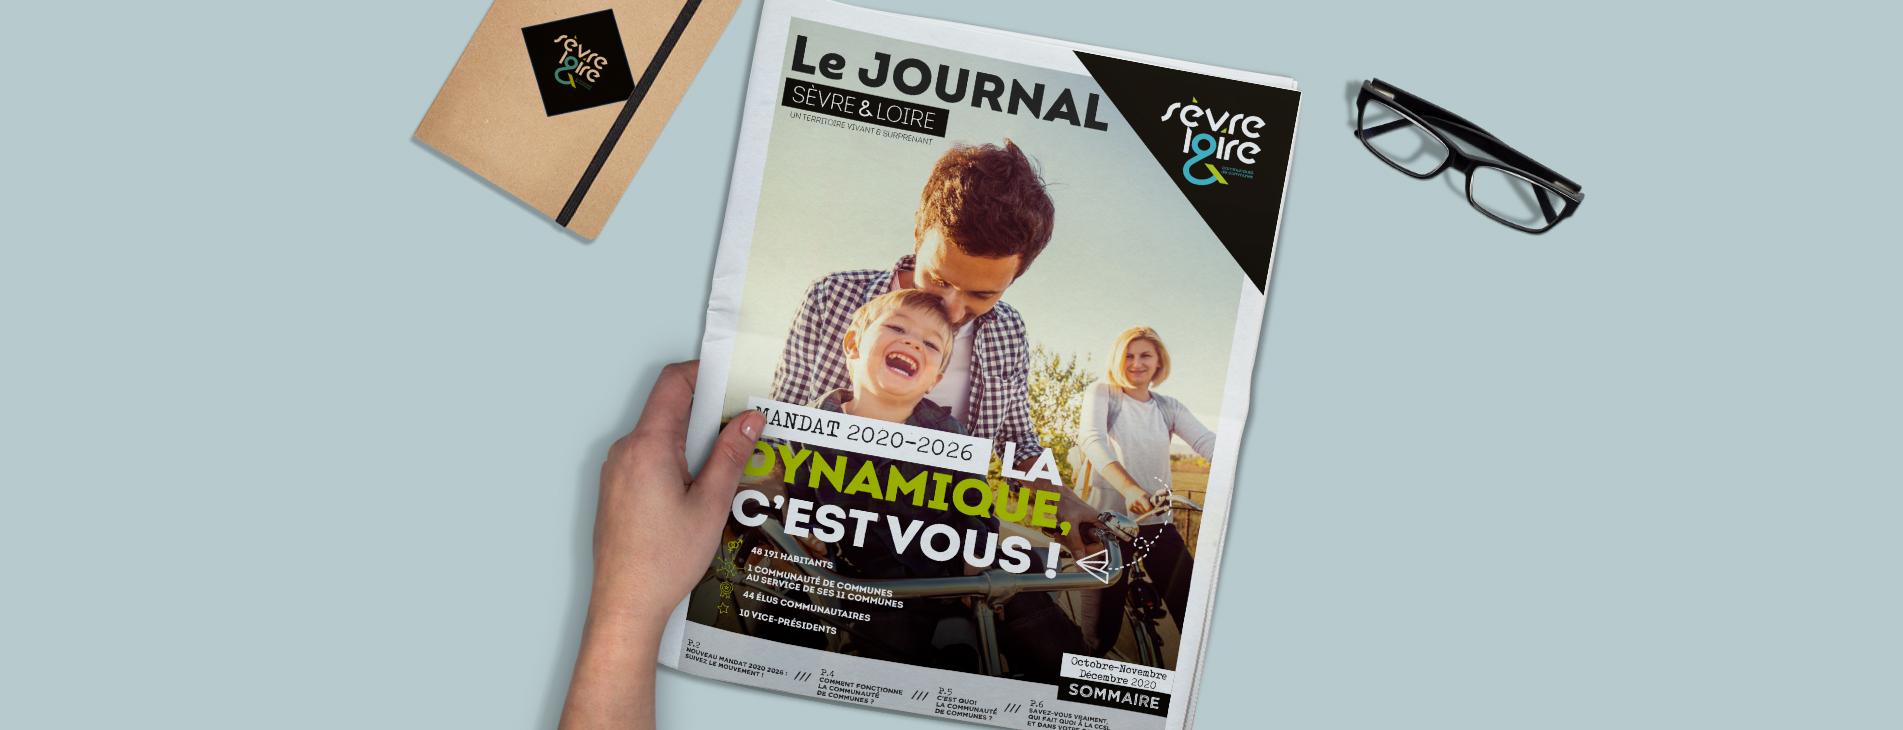 header mockup Journal Sèvre & Loire - n°1- 1903x730